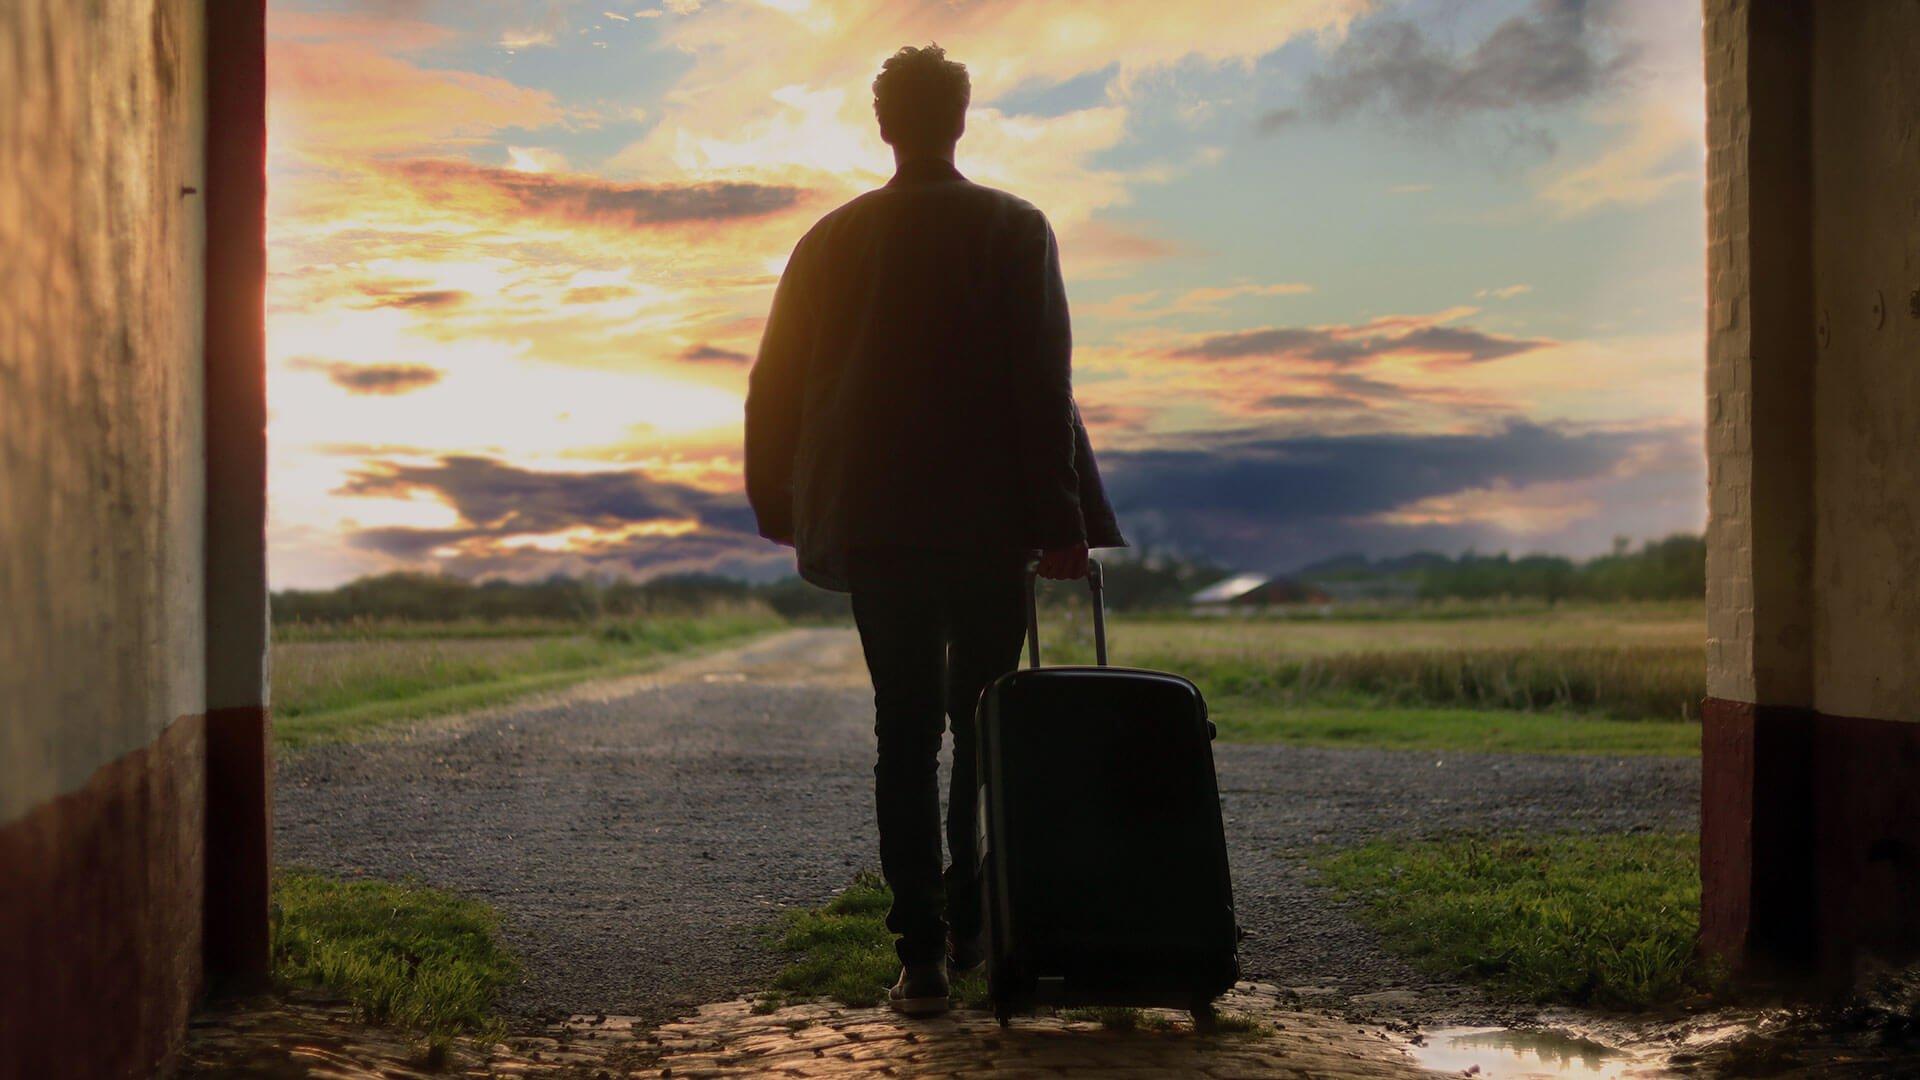 Leaving the Church and Leaving the Faith by Dr. John Neufeld